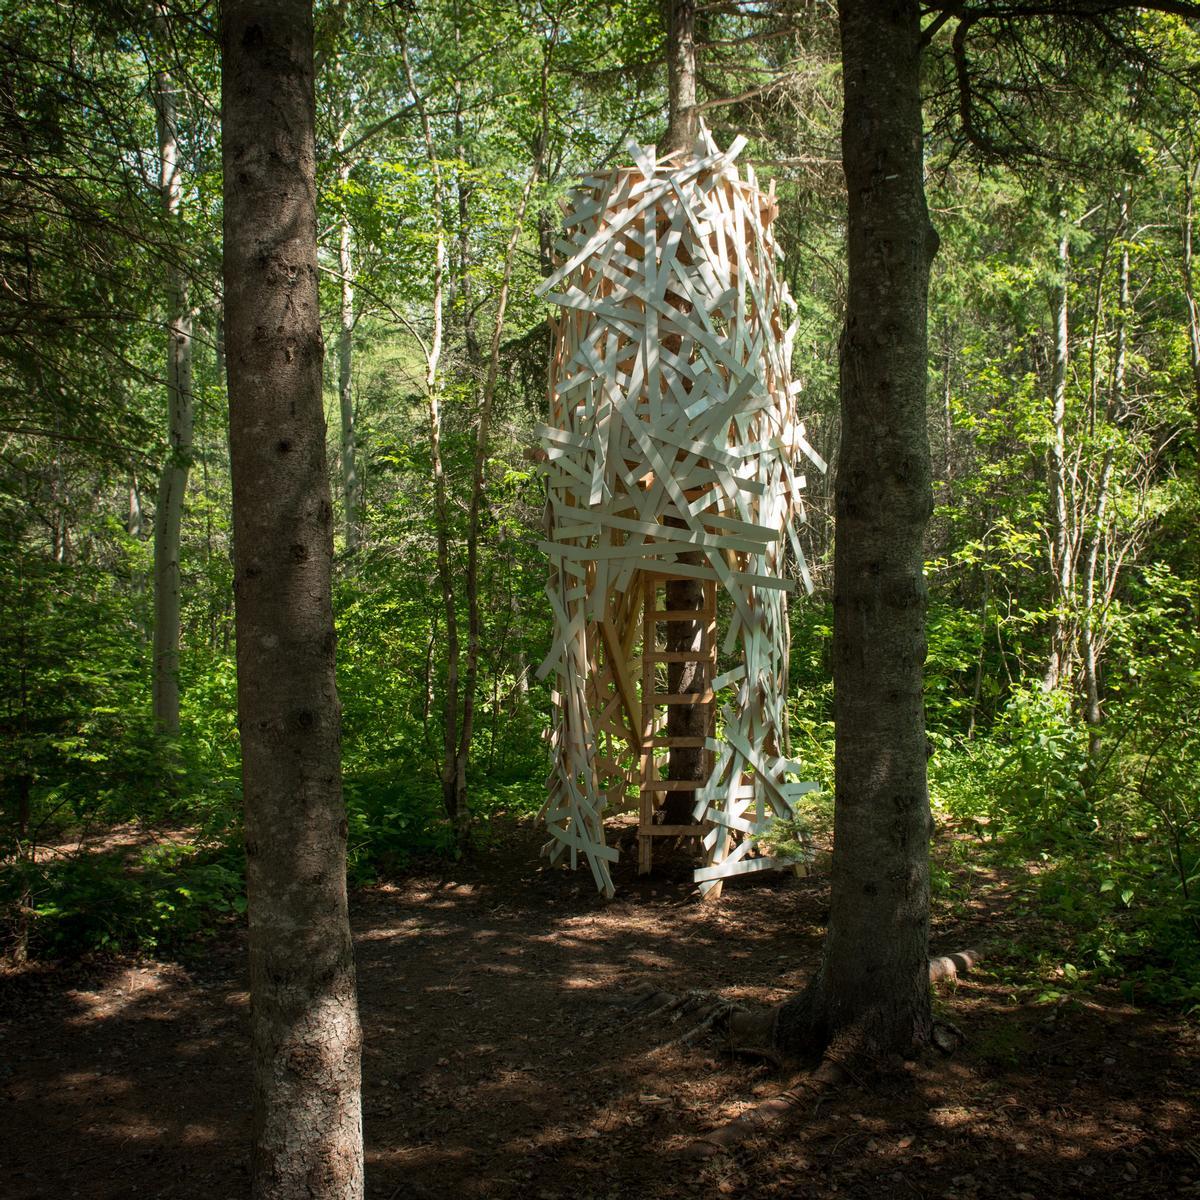 La Chrysalide by landscape architects Gabriel Lacombe and Virginie Roy-Mazoyer / Martin Bond/v2com